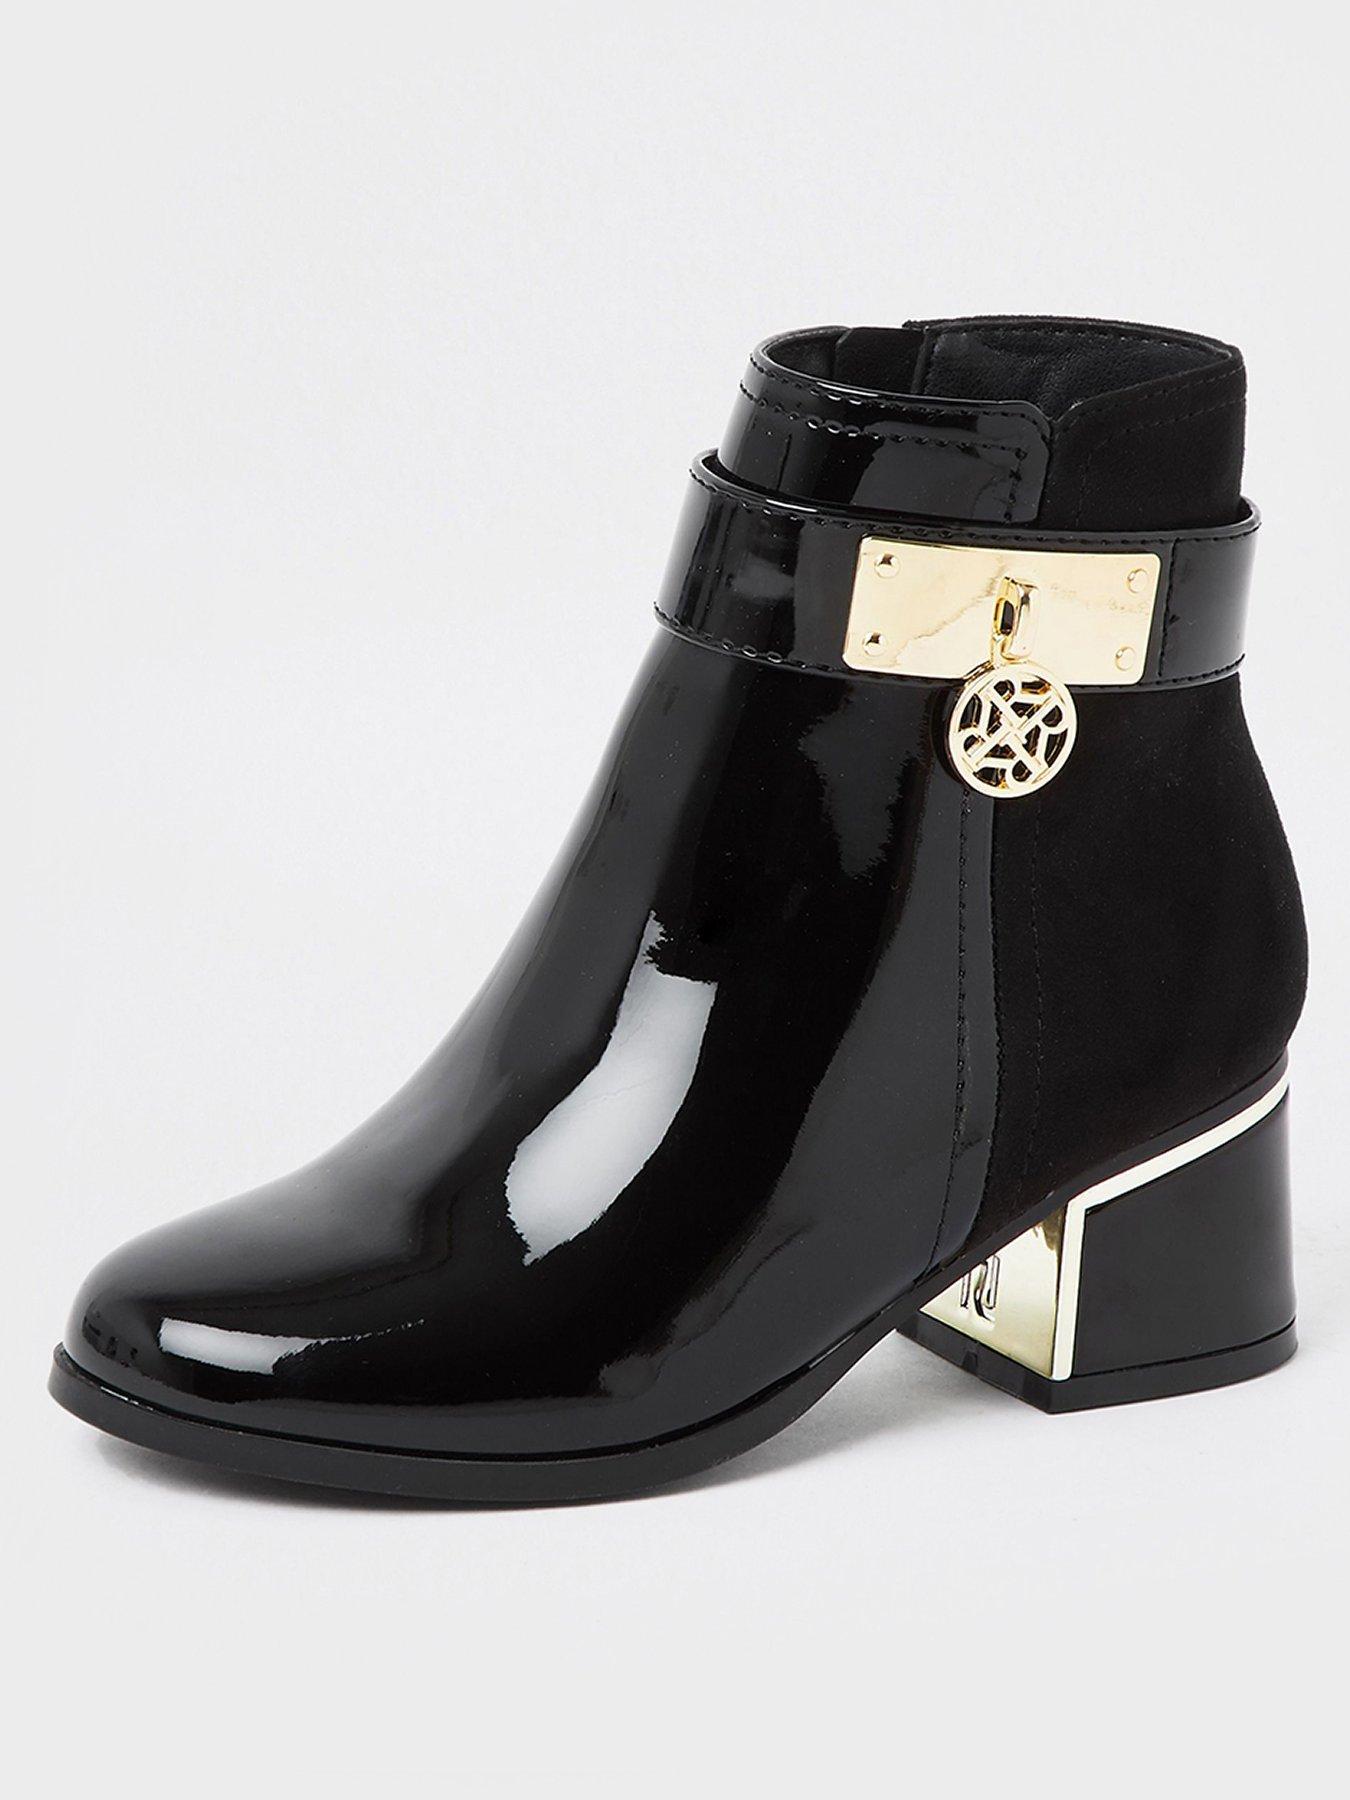 River island | Shoes \u0026 boots | Child